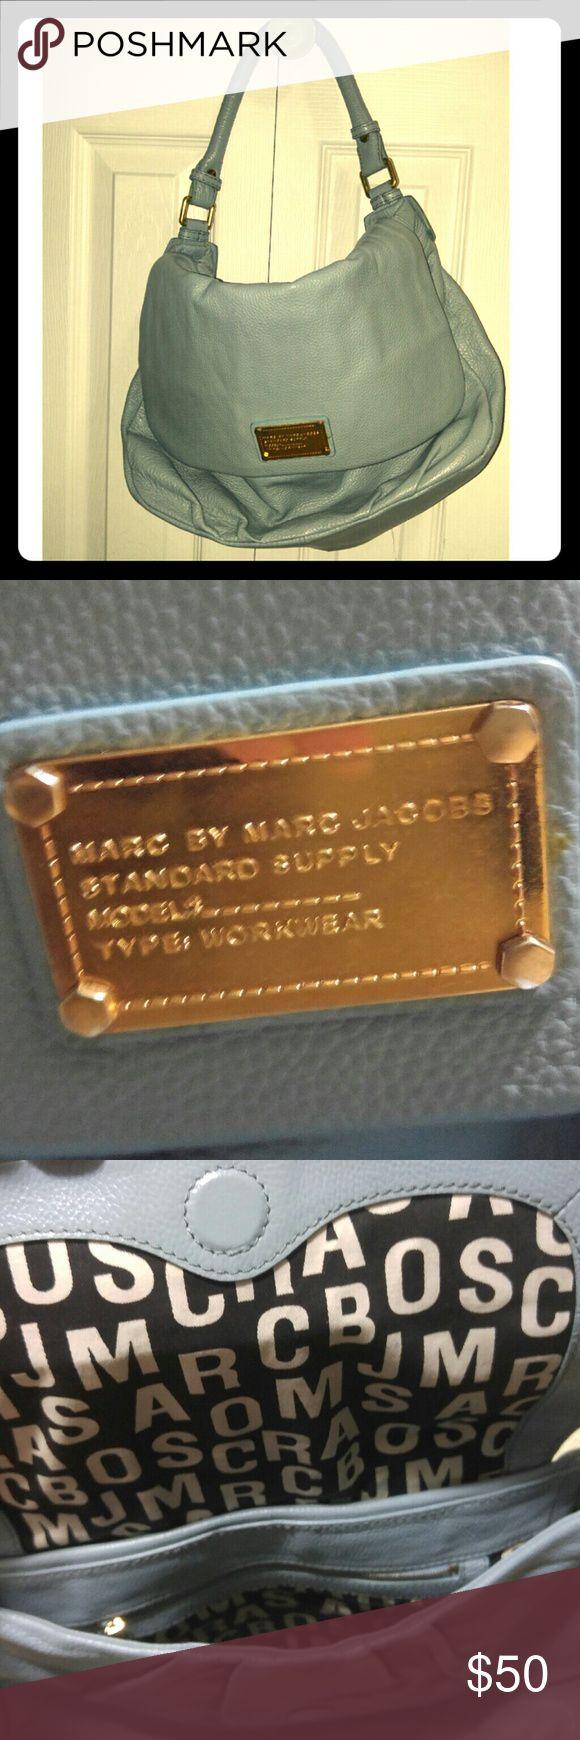 Marc by Marc Jacobs Handbag Periwinkle blue. Great handbag for work. Marc by Marc Jacobs Bags Shoulder Bags